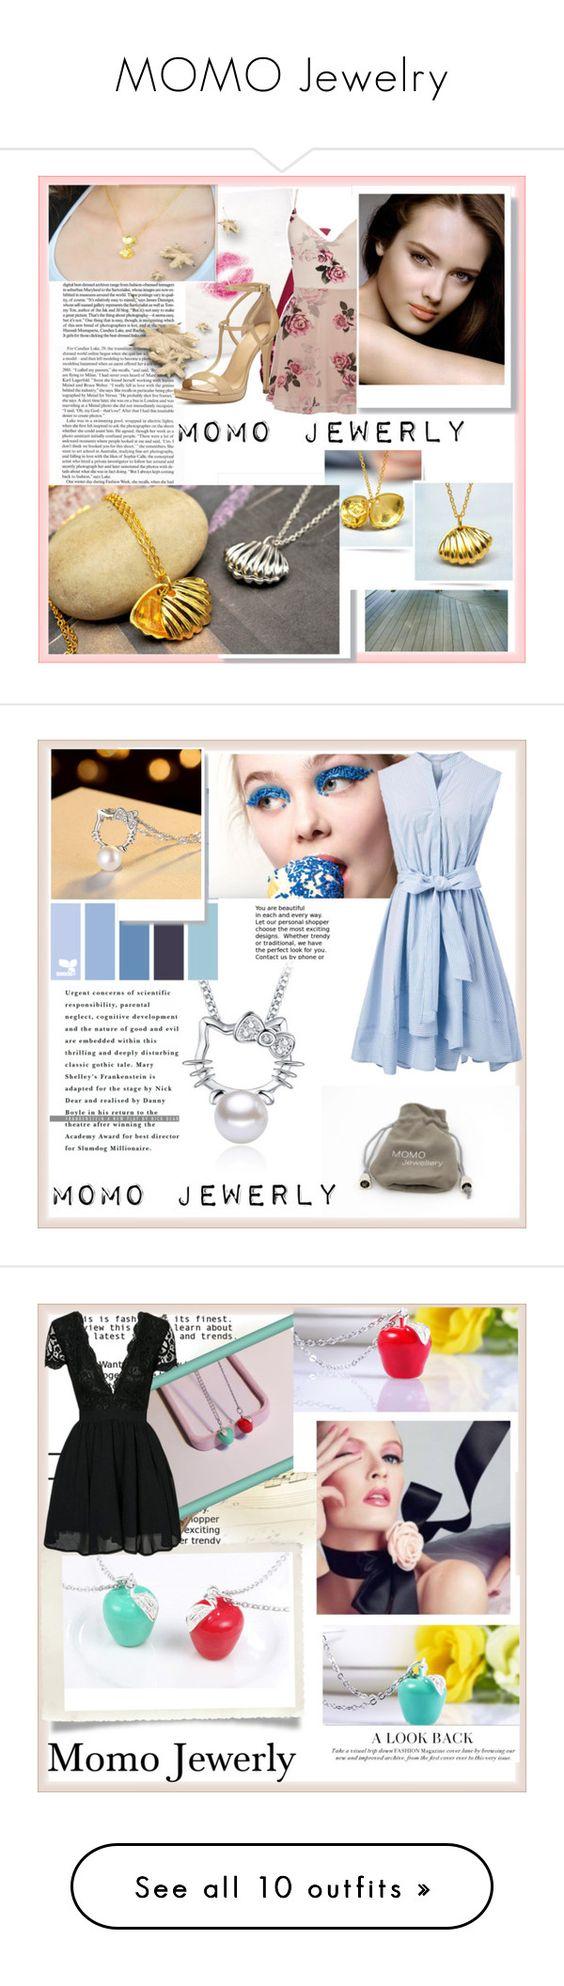 """MOMO Jewelry"" by damira-dlxv ❤ liked on Polyvore featuring Chanel, Lipsy, MICHAEL Michael Kors, Hello Kitty, Will Cotton, Chicwish, MoMo, FRACOMINA, John-Richard and Lattori"